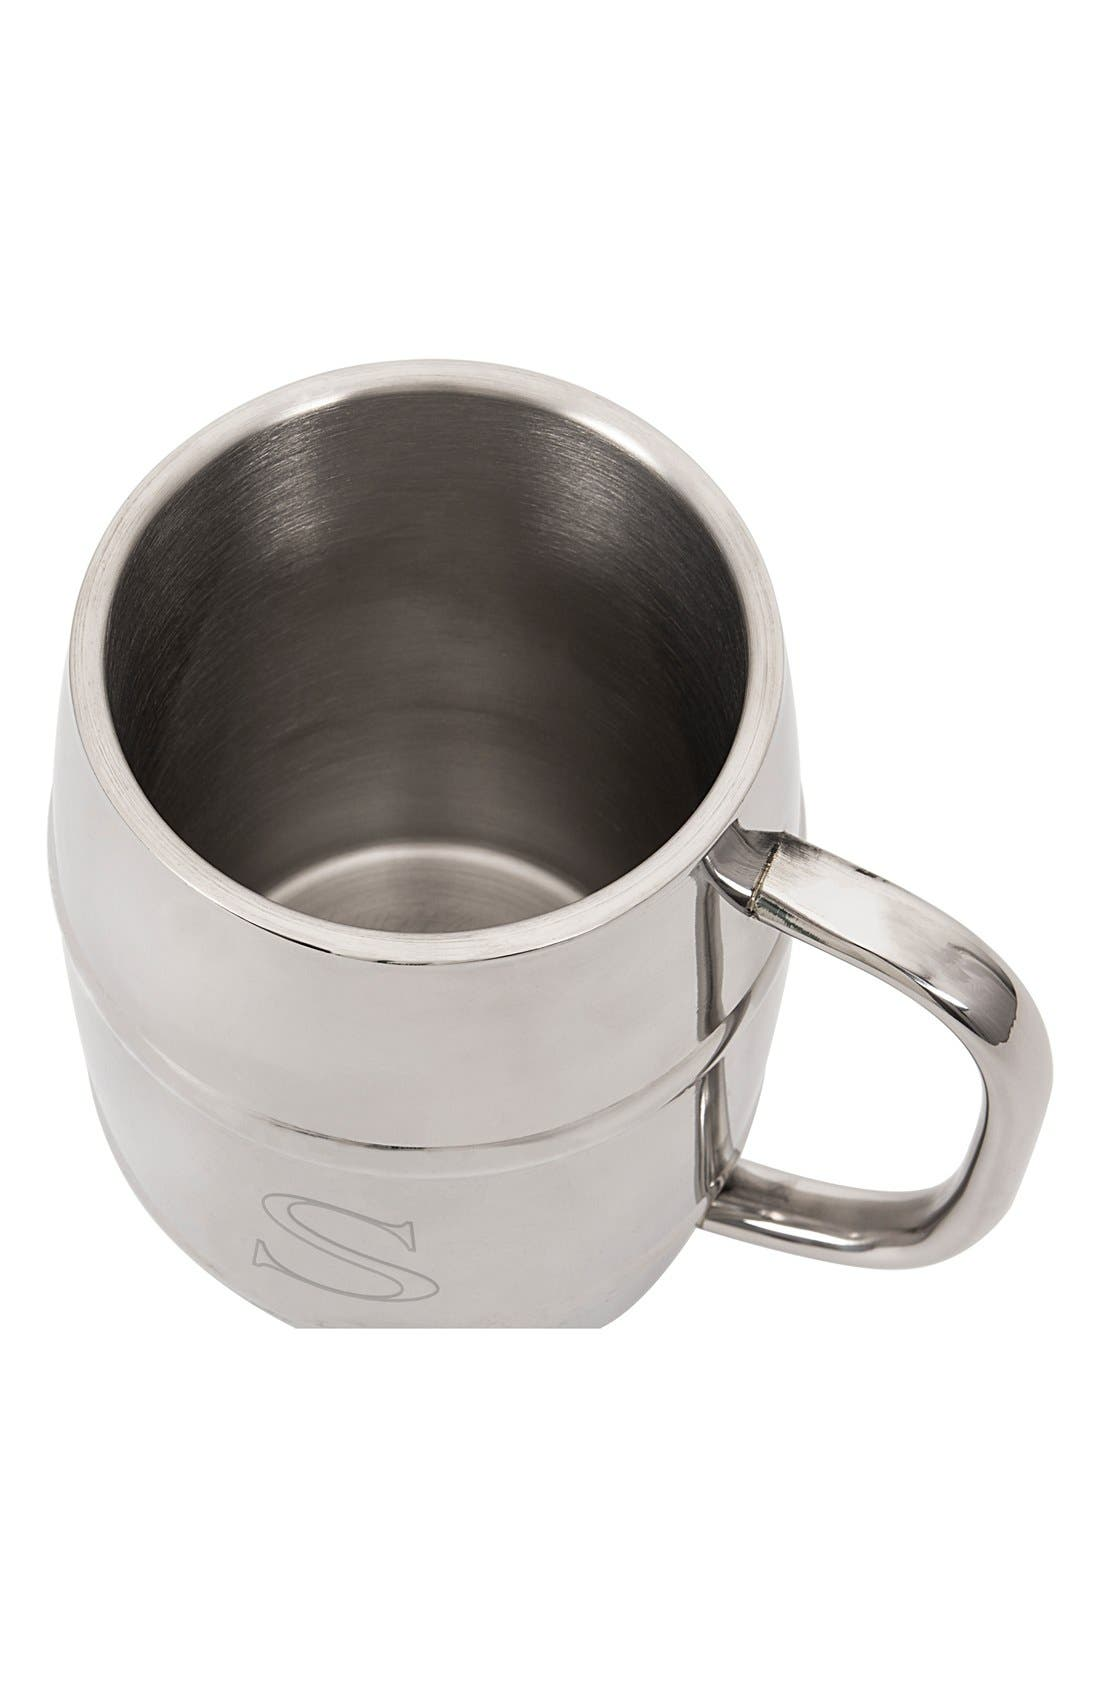 'XL Beer Keg' Monogram Mug,                             Alternate thumbnail 2, color,